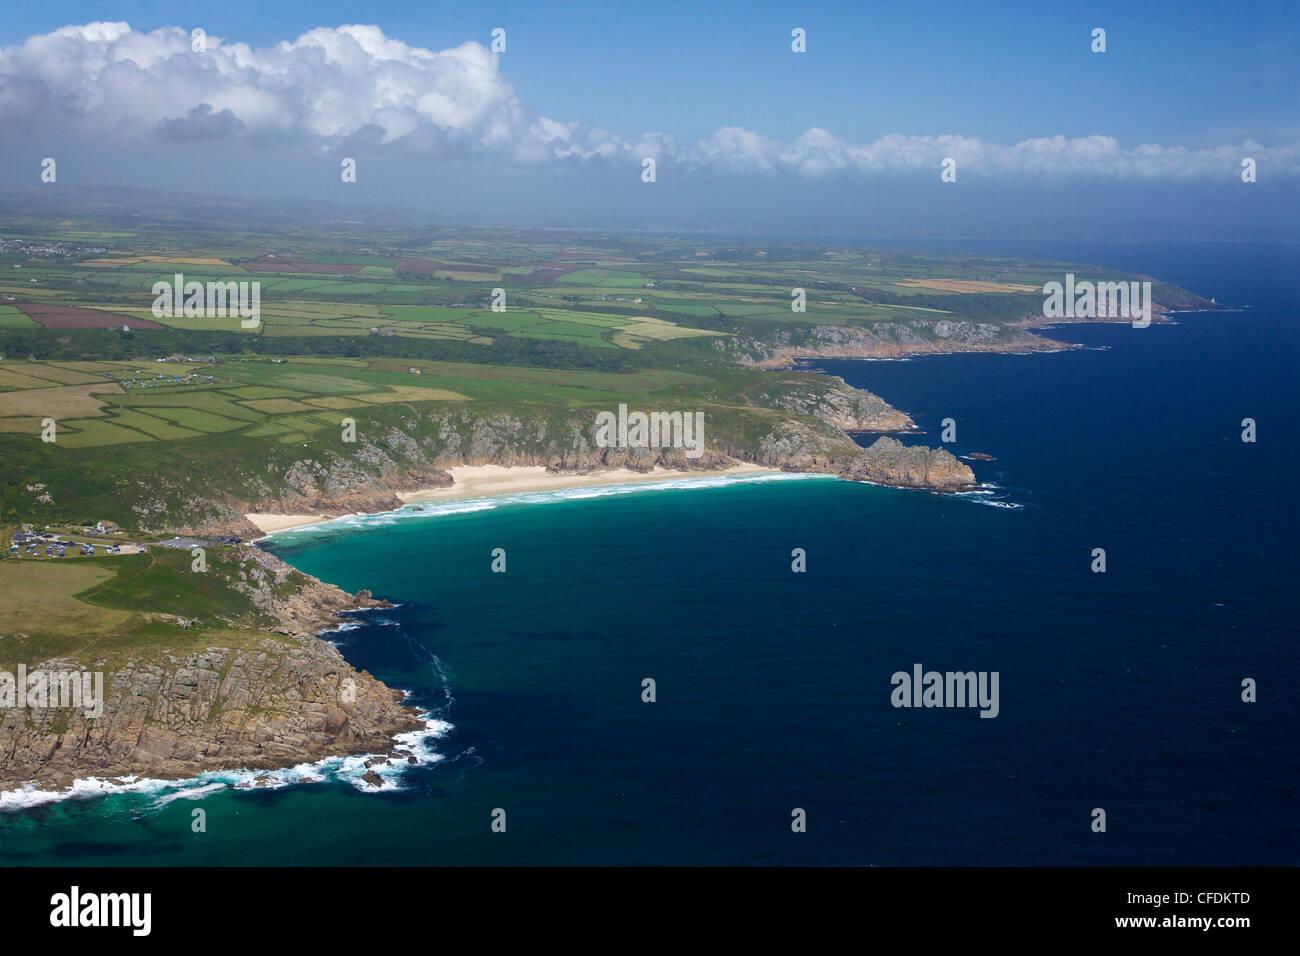 Luftaufnahme von Lands End Halbinsel, Treen Cliff, Logan Rock, West Penwith, Cornwall, England, UK Stockbild